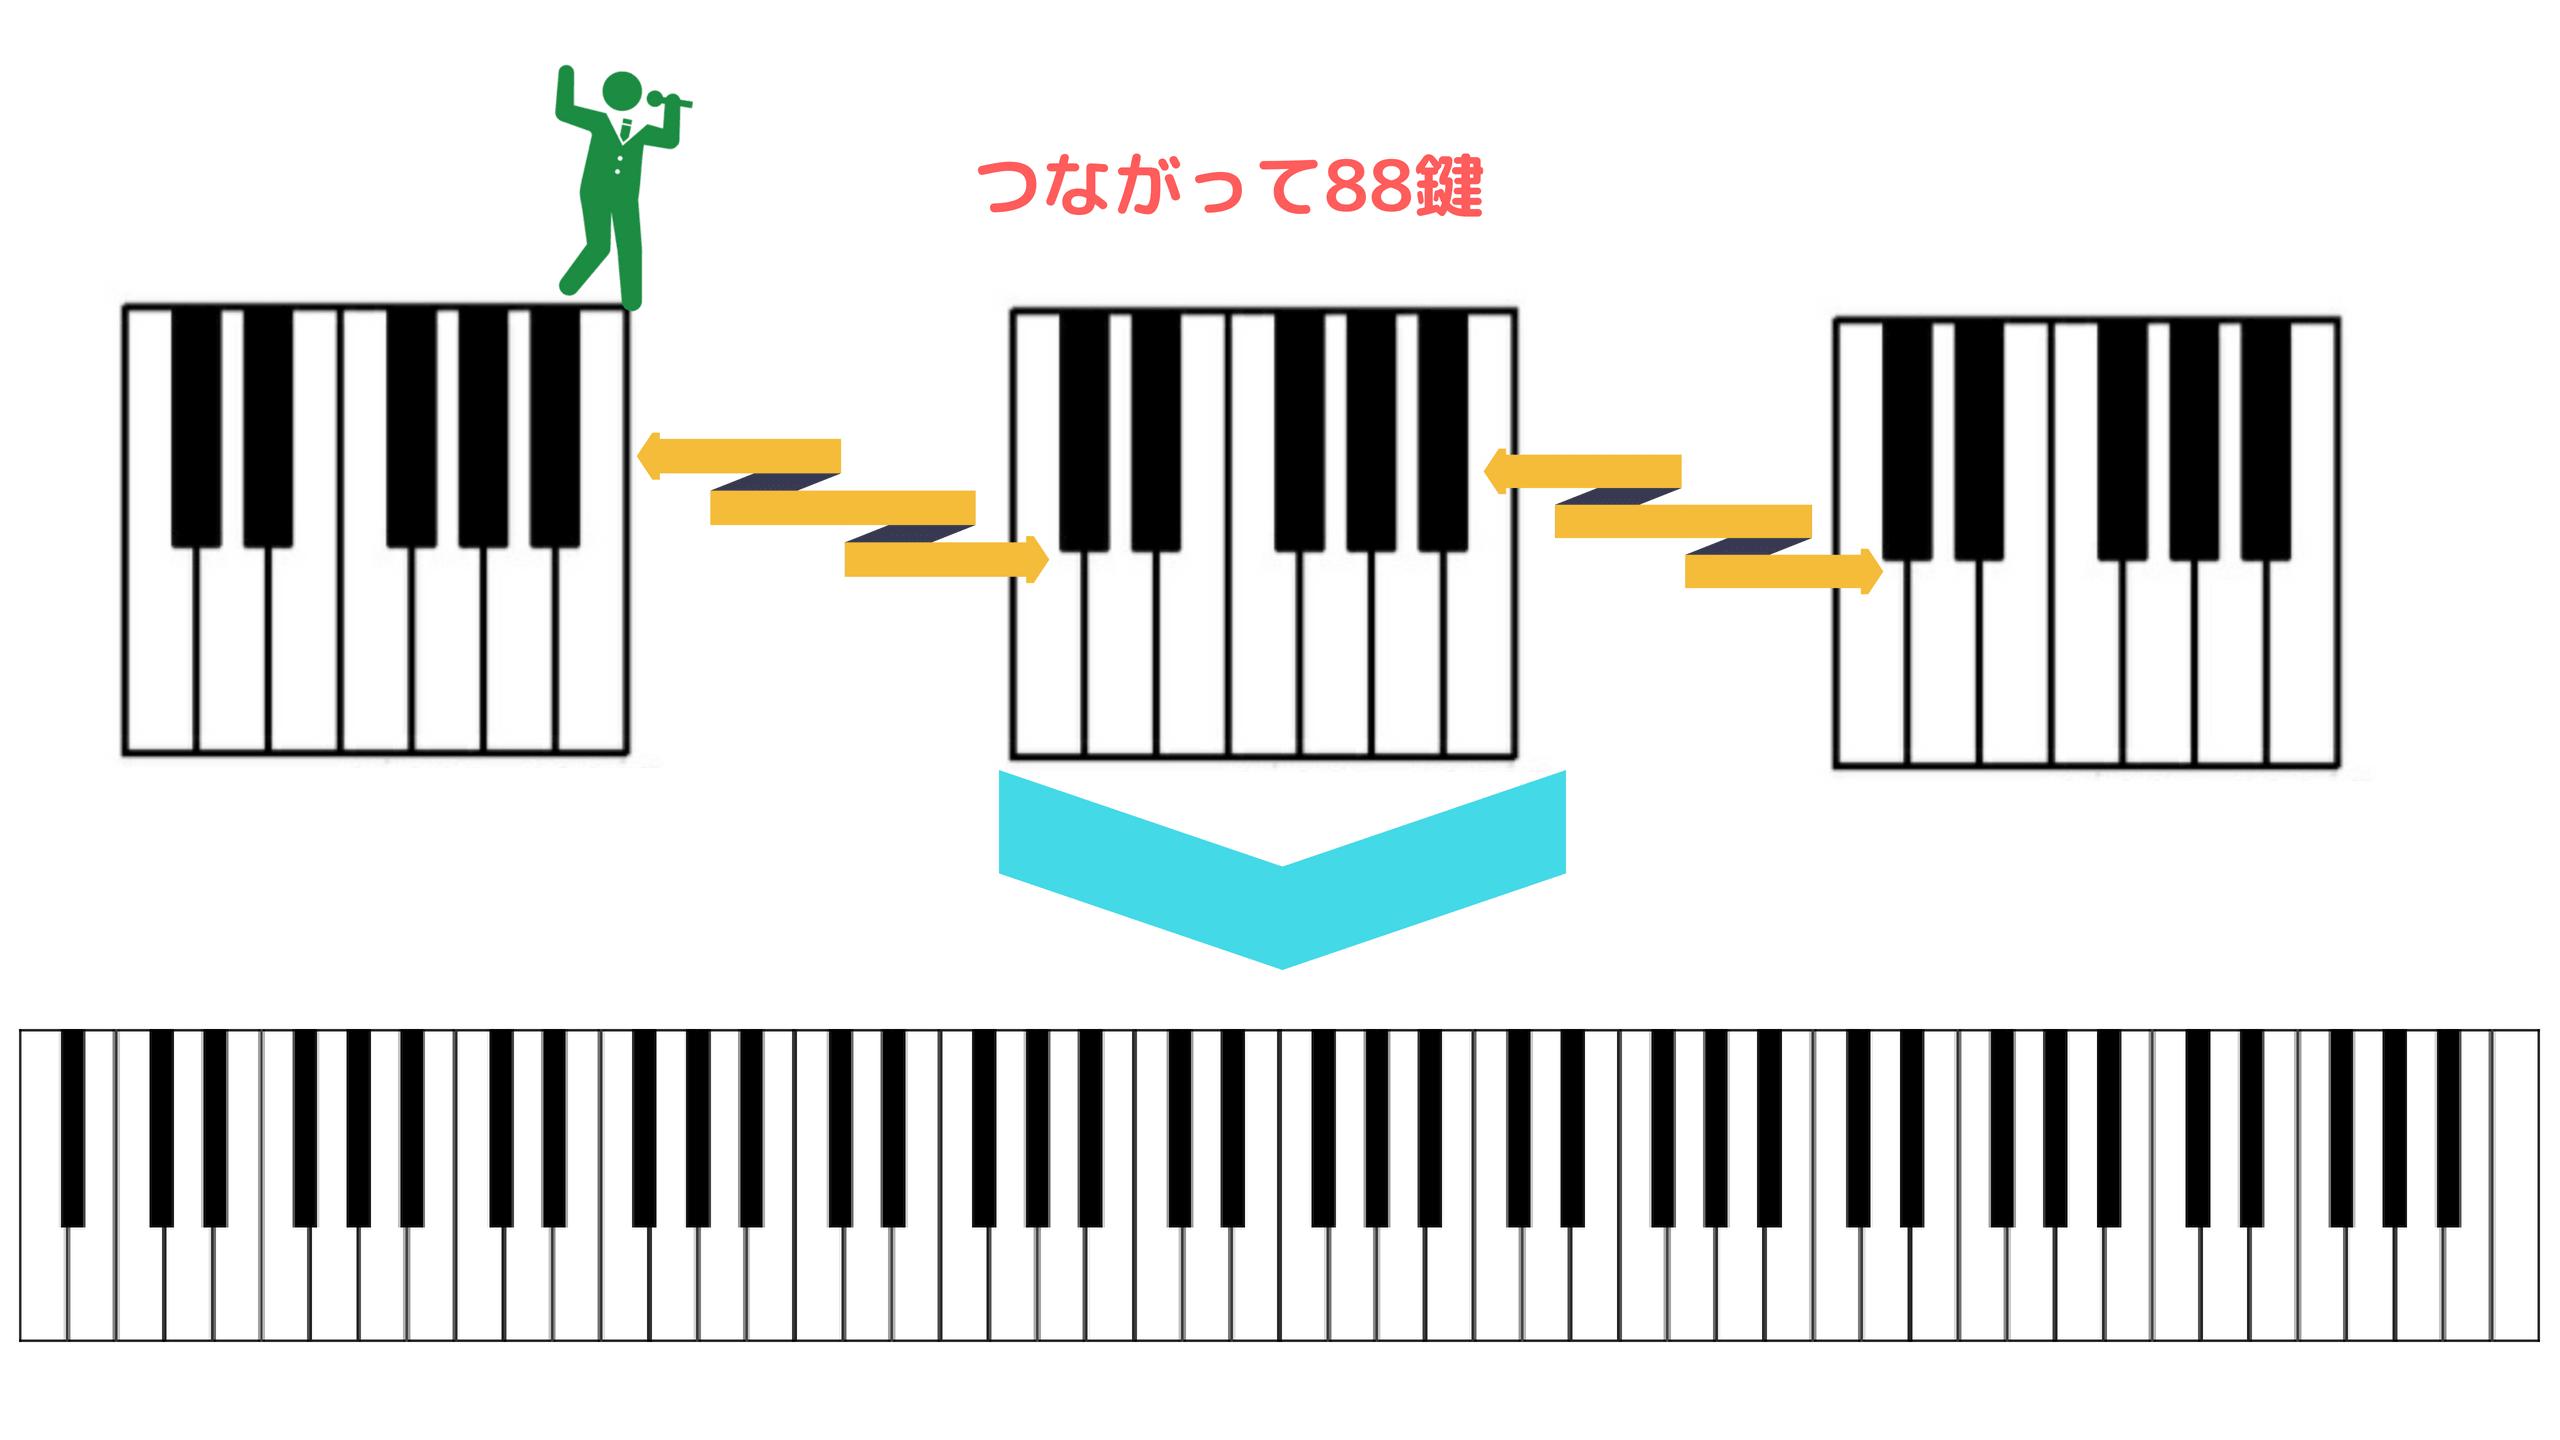 pianorecipe/key12345